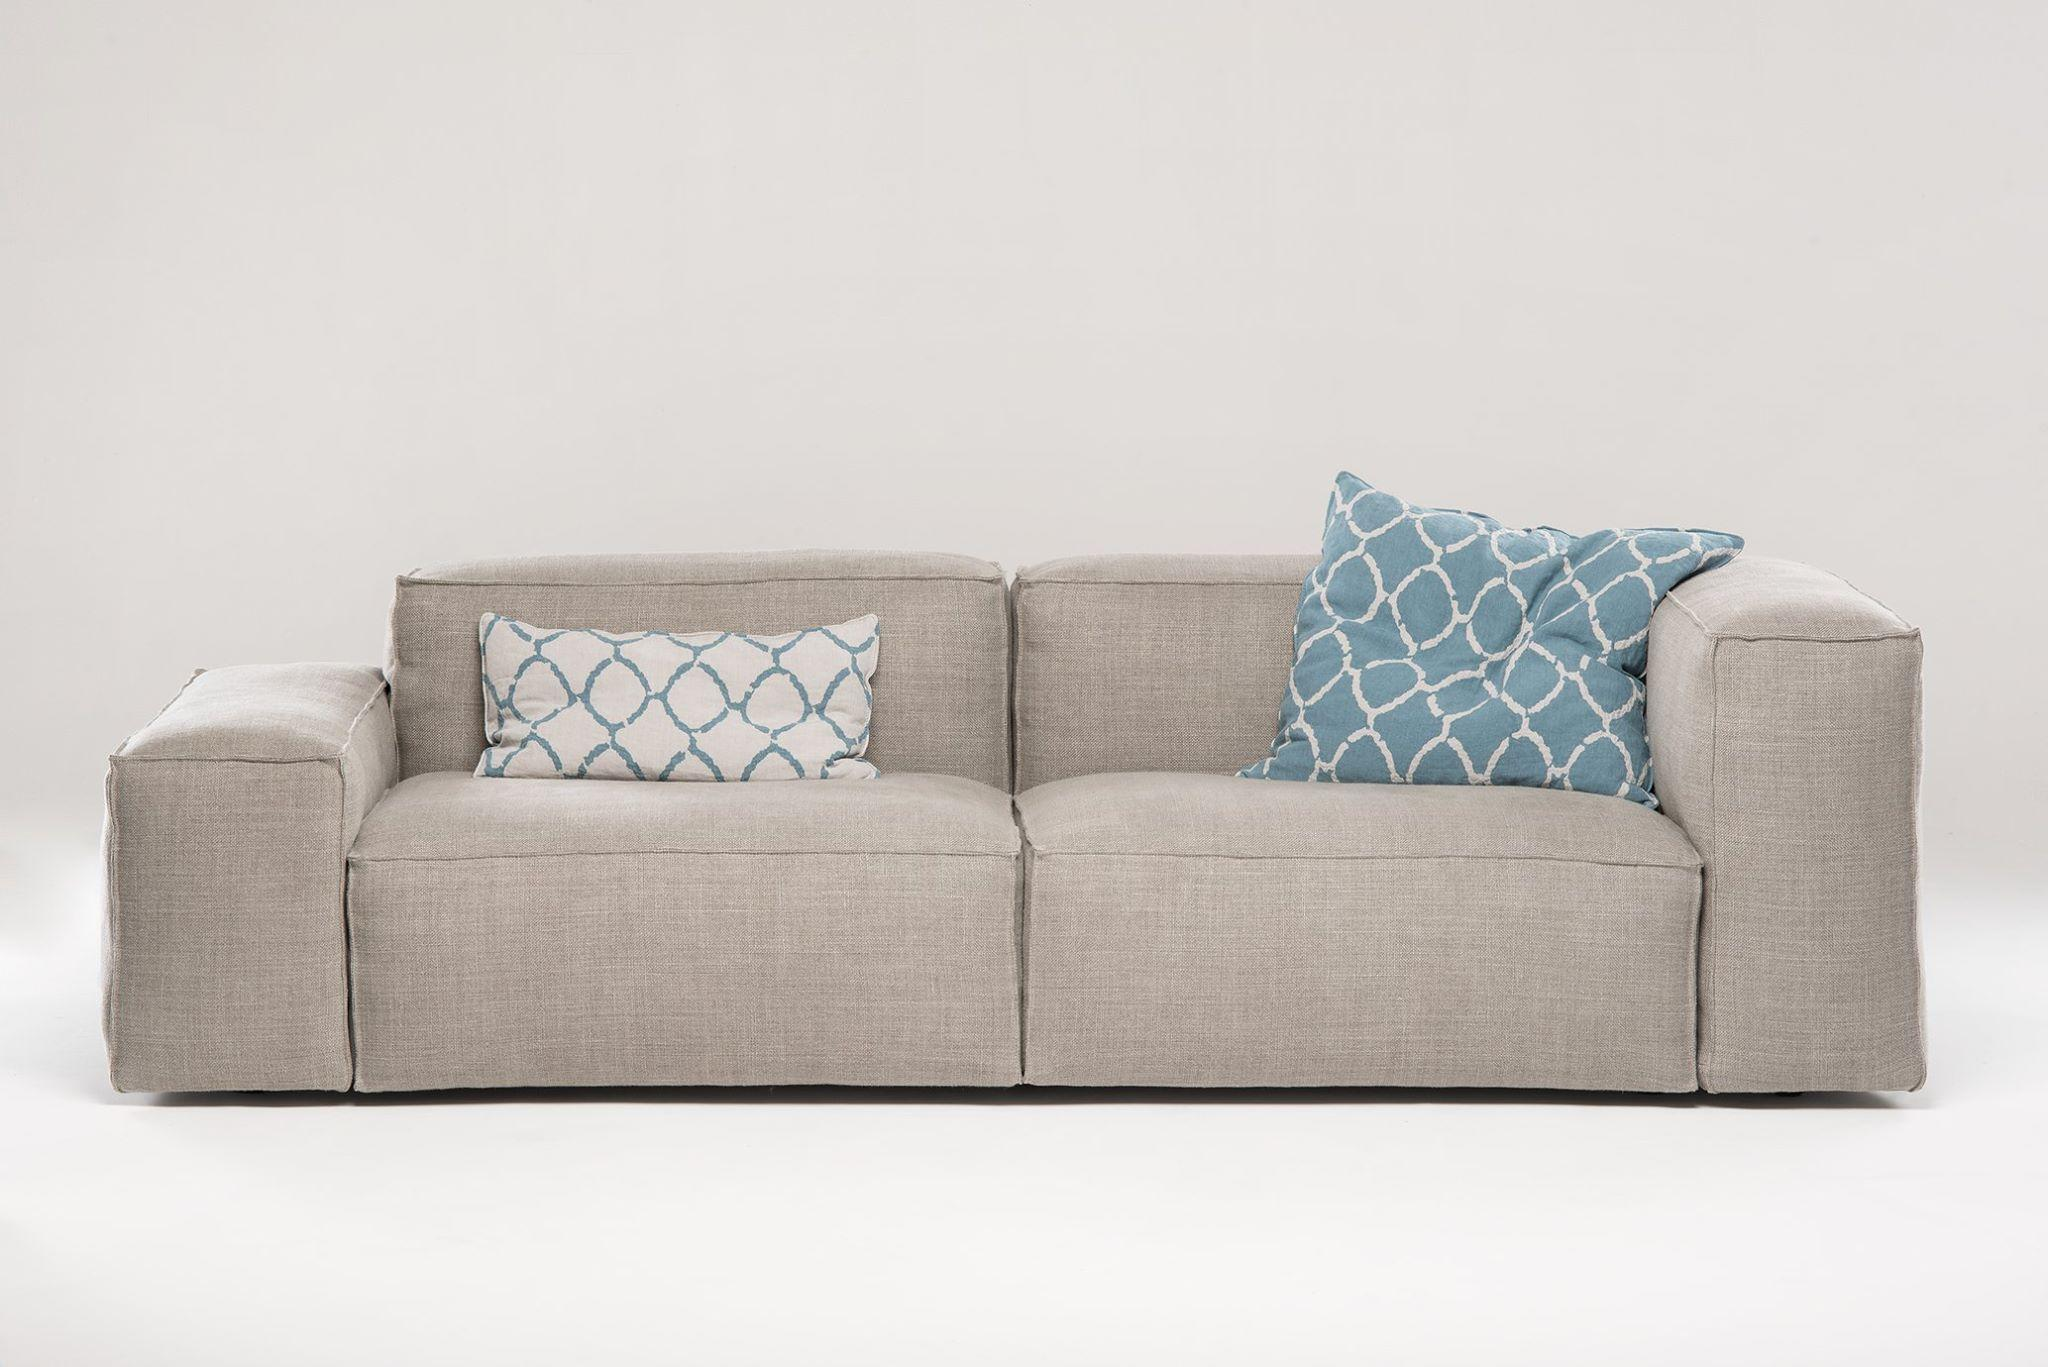 Modern Italian Designer Sofa Tailor Made For Sale at 1stdibs